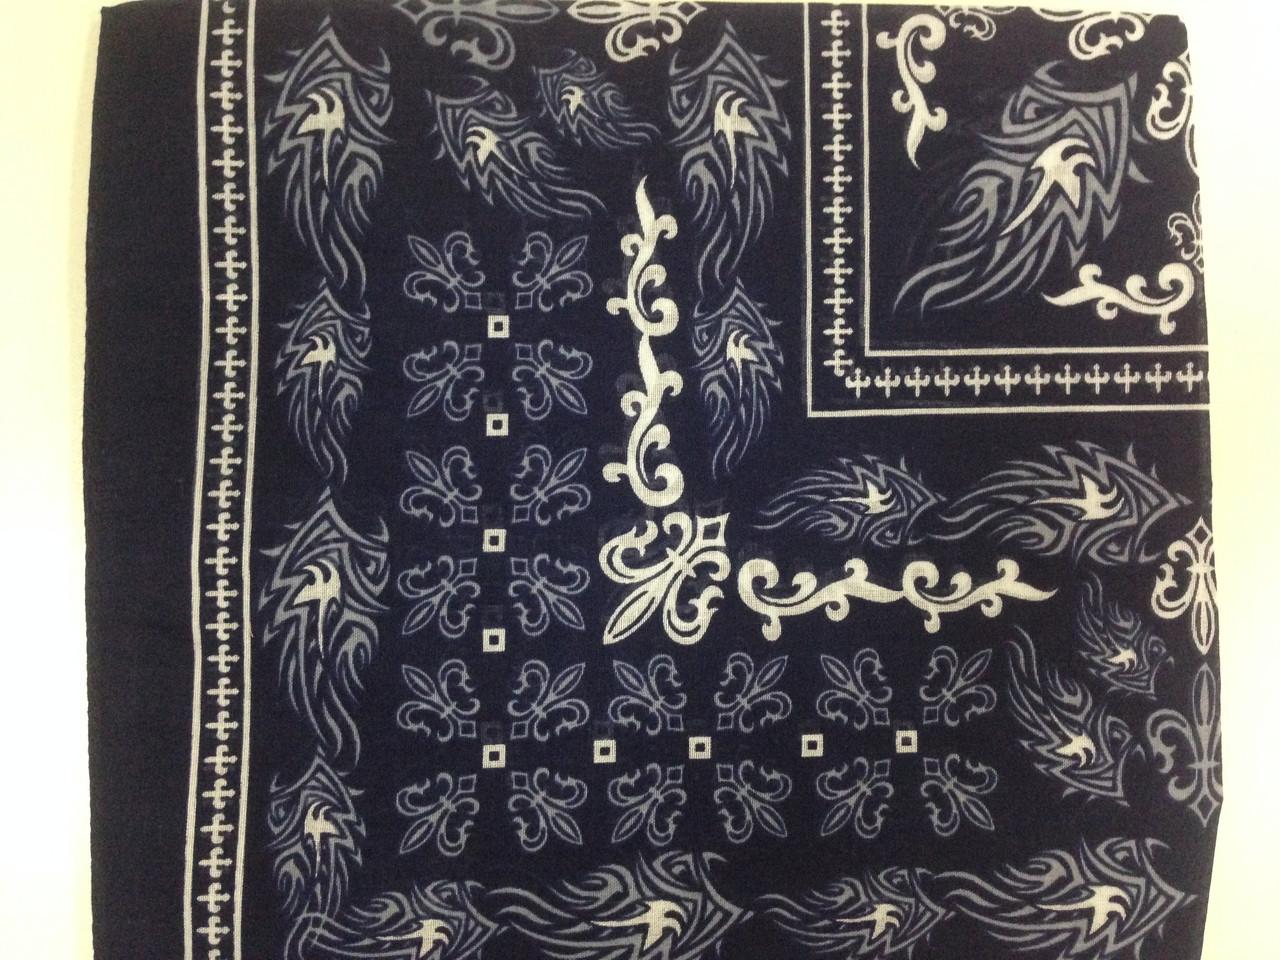 Тёмно синяя бандана - платок летняя из хлопка с рисунком размер 55 х 55 см